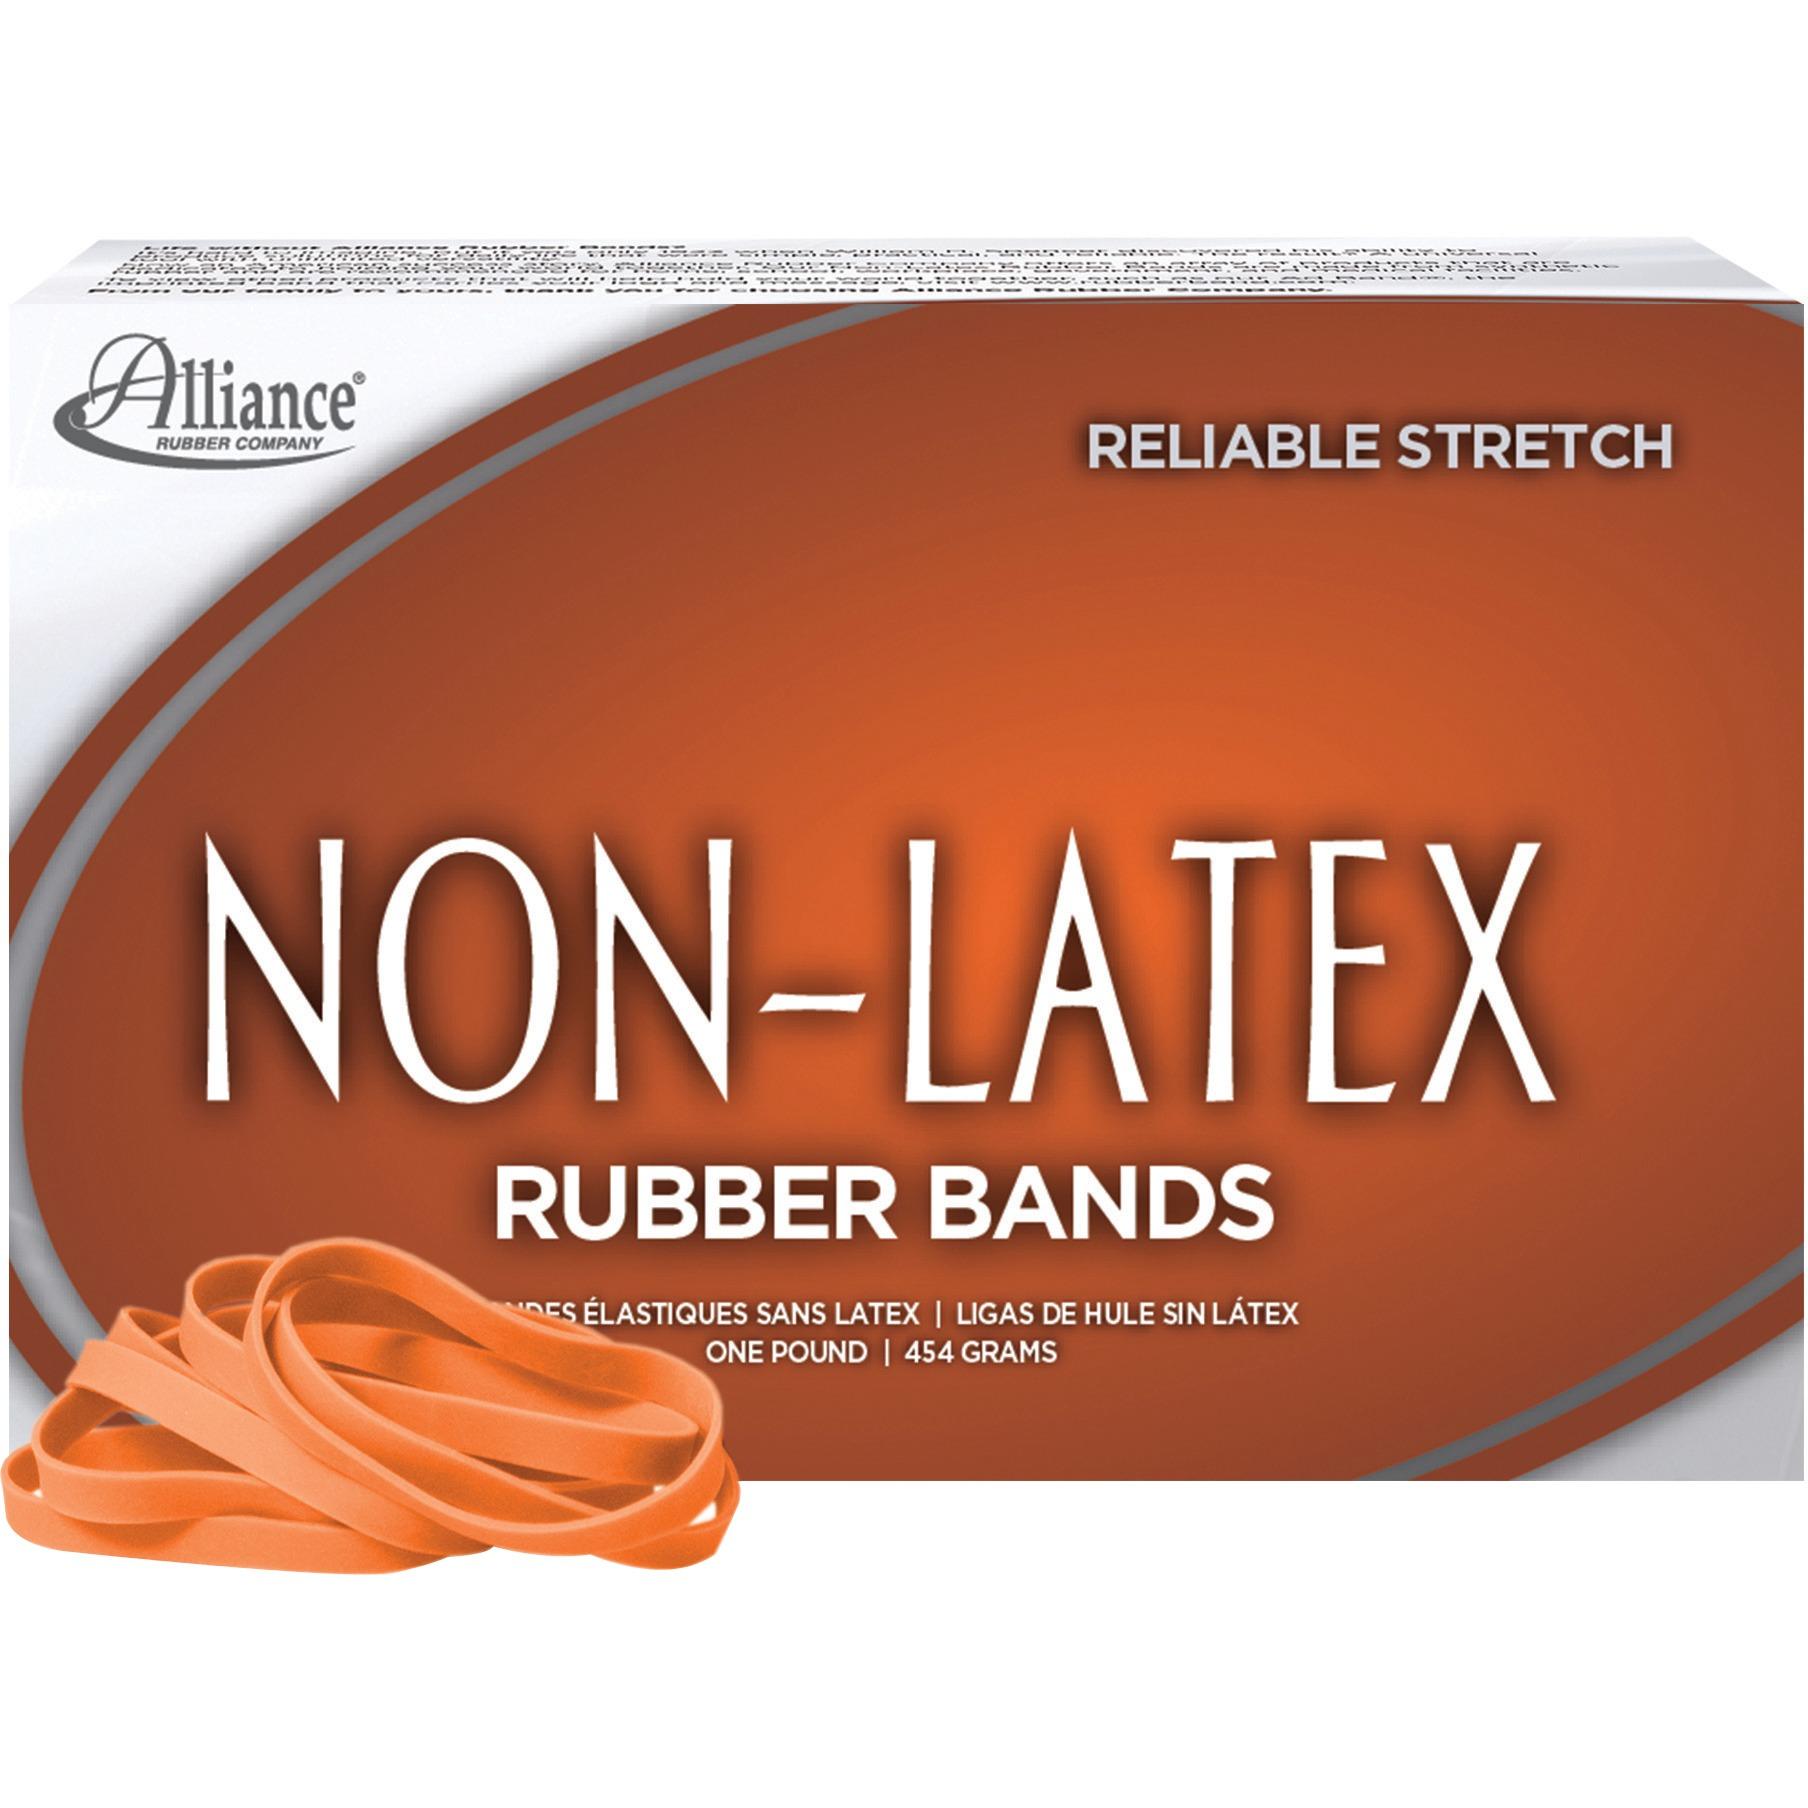 Alliance Non-Latex Rubber Bands, Sz. #64, Orange, 3 1/2 x 1/4, 380 Bands/1lb Box